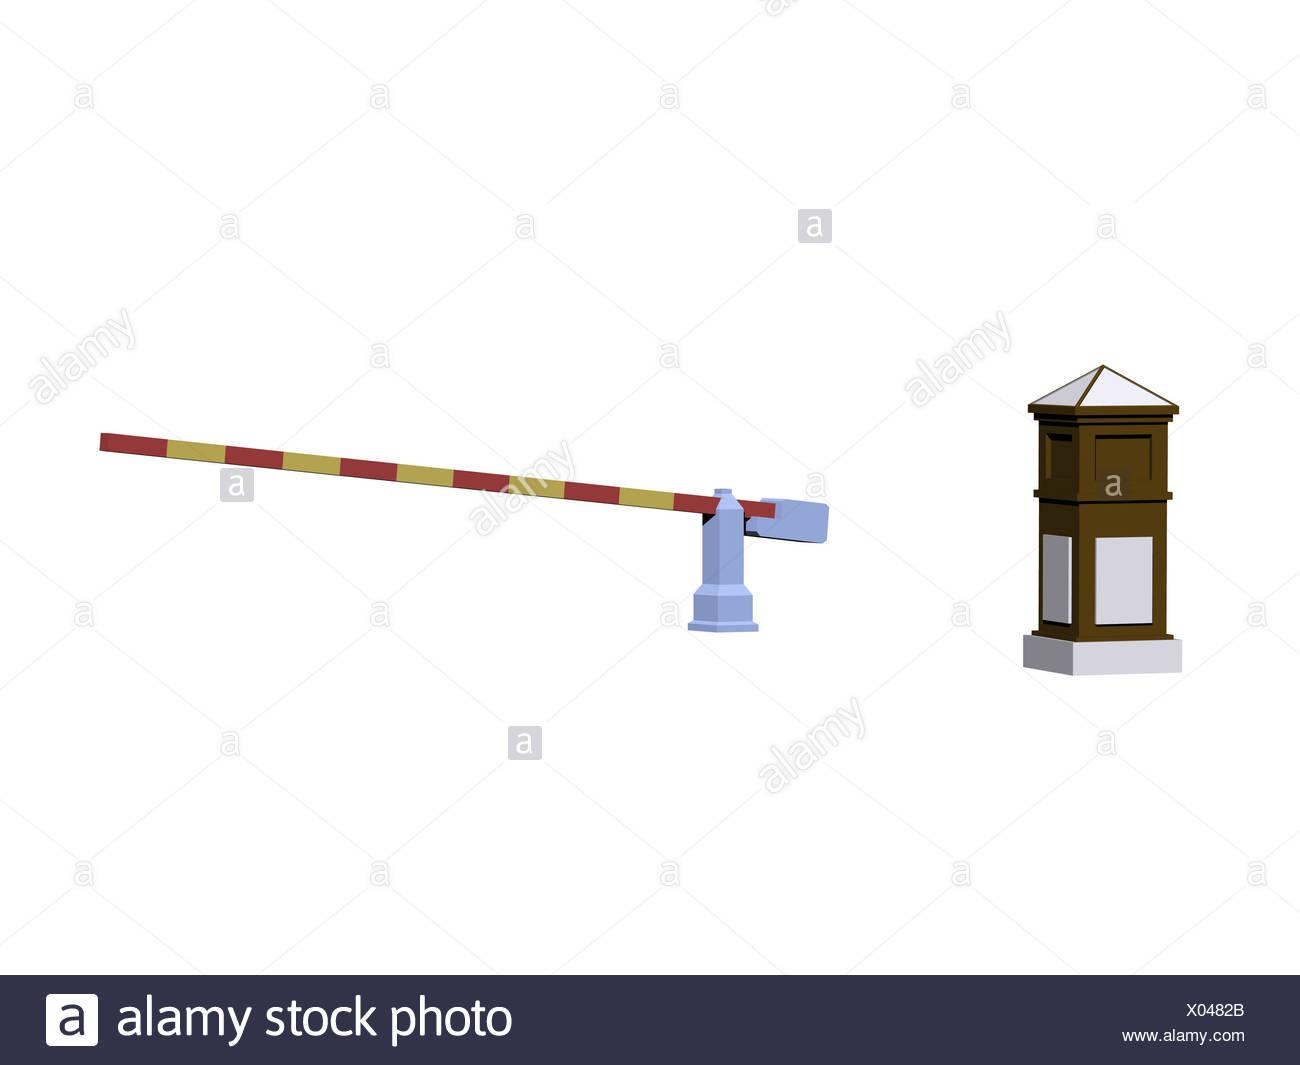 turnpike border fence exempted - Stock Image